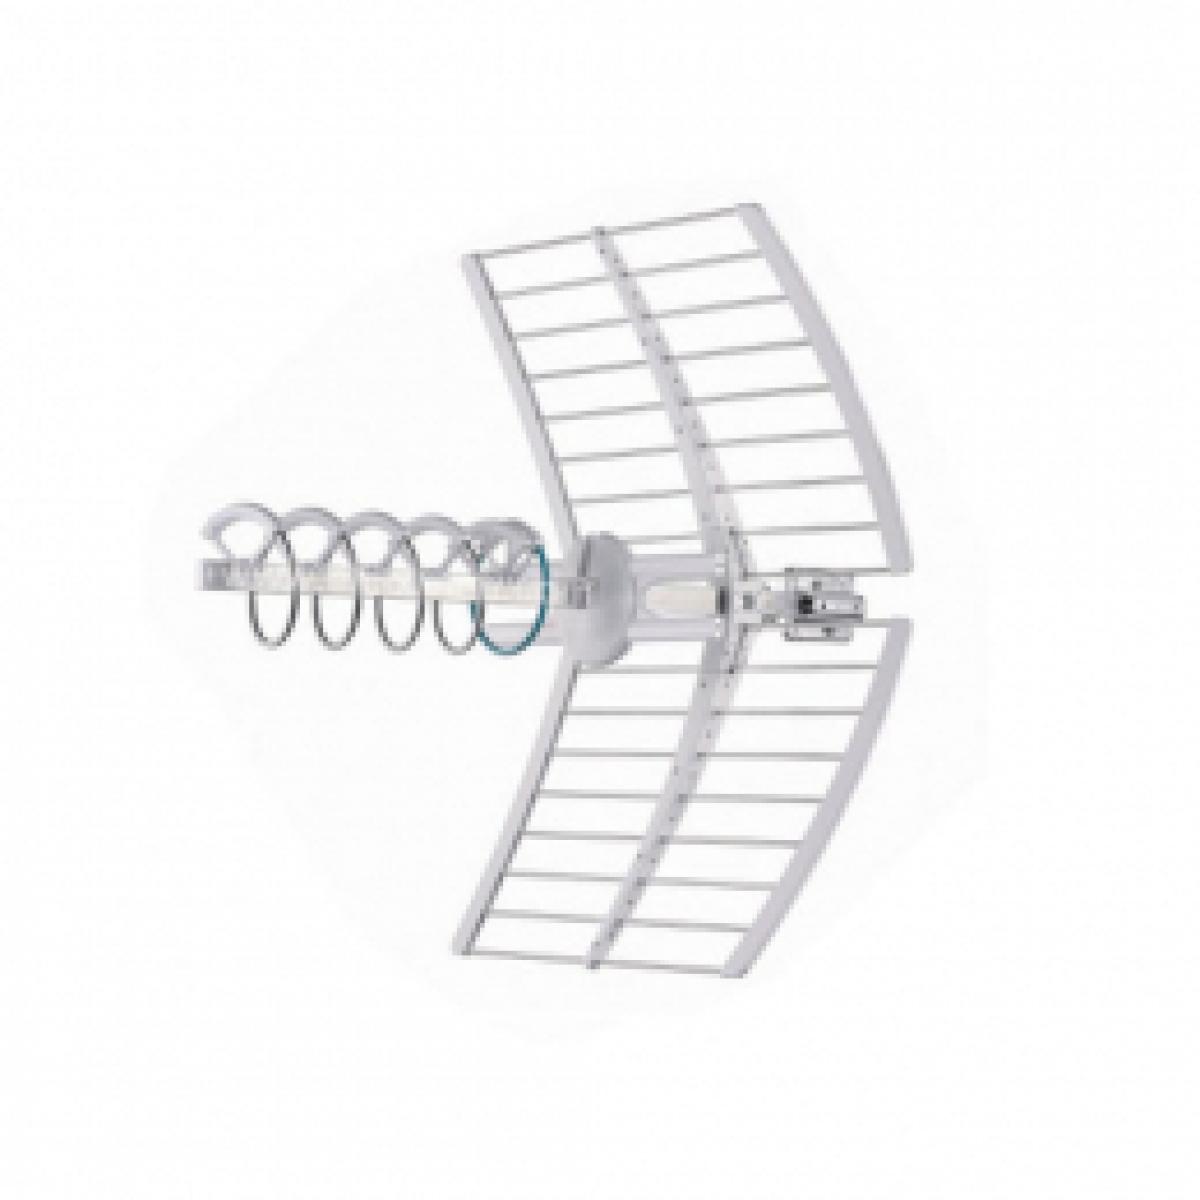 Antenna elika e21-e60 uhf 17db lte 213226 fracarro